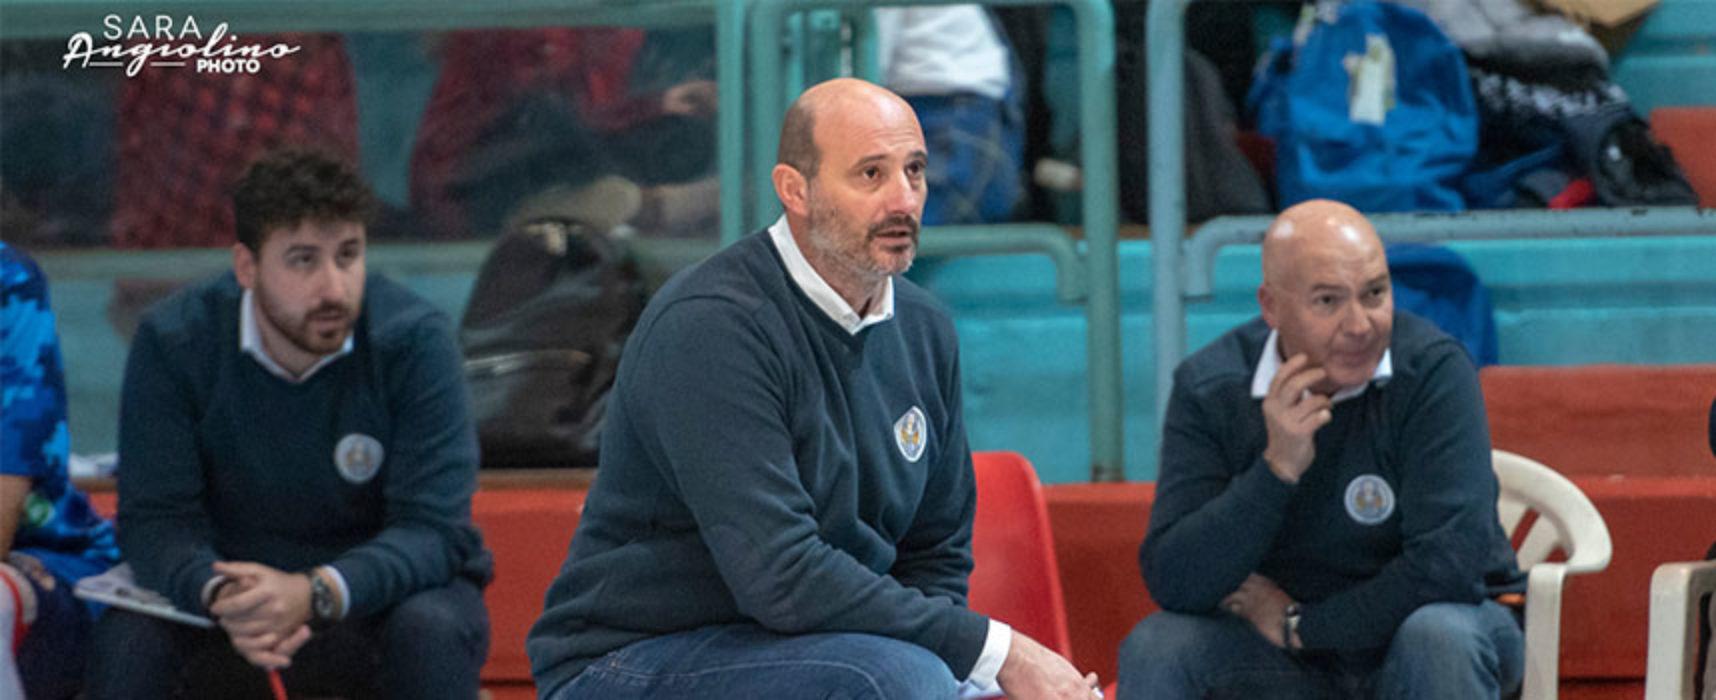 Basket, Alpha Pharma Bisceglie impegnata contro la capolista Taranto